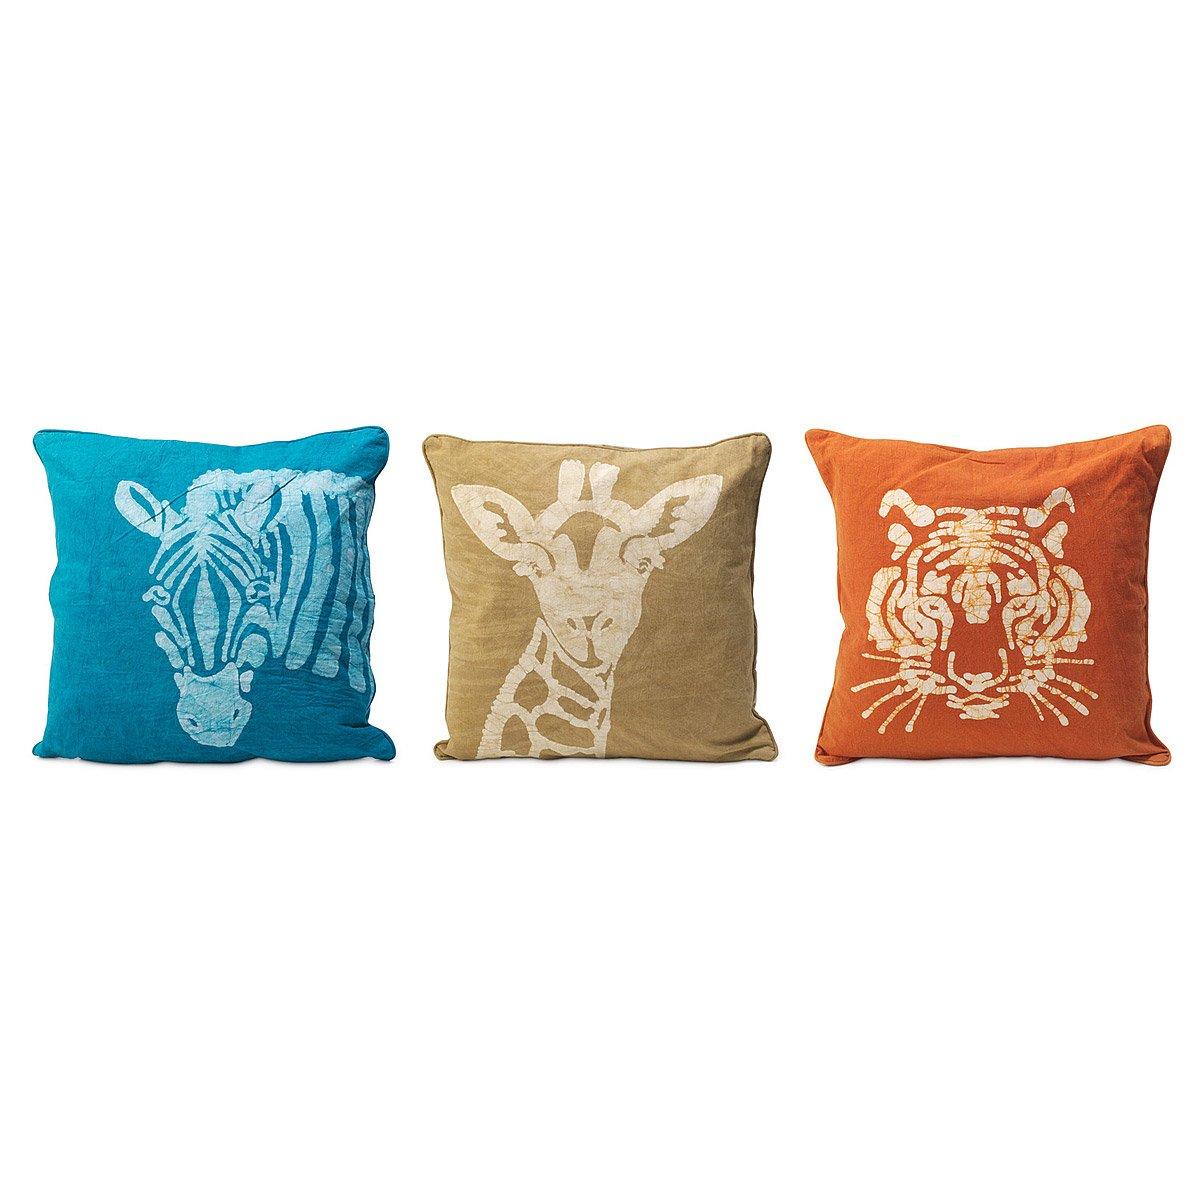 safari animal pillows  safari animal pillows home decor unique  - safari animal pillows  thumbnail